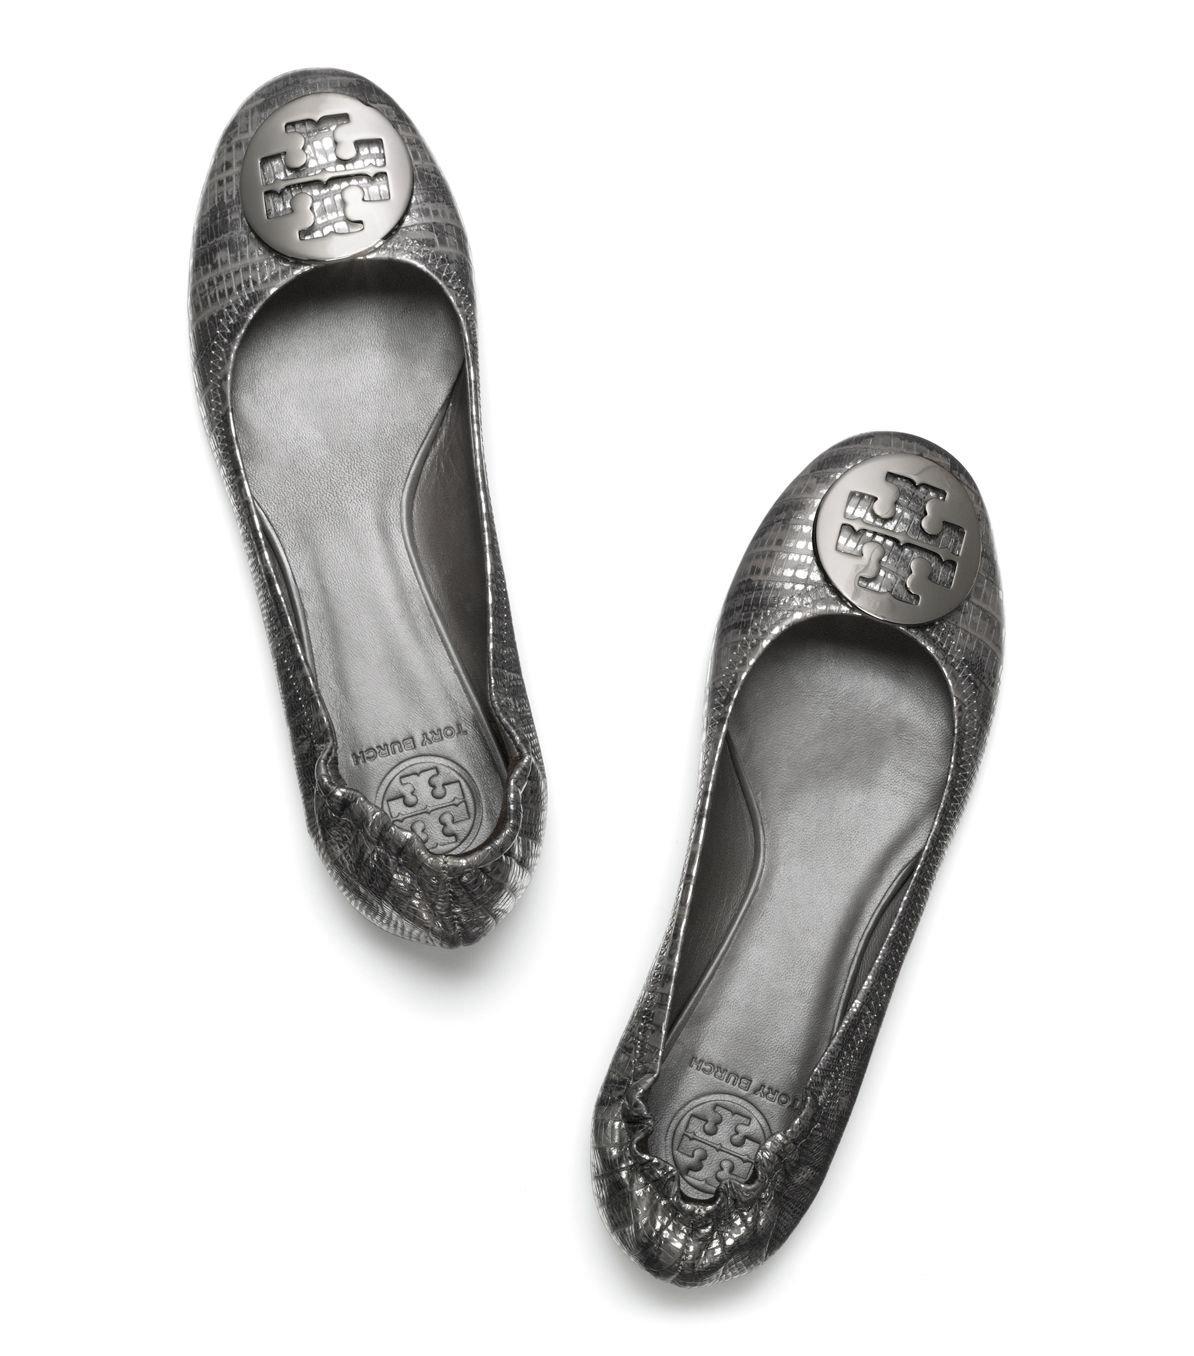 35db488a4 Lyst - Tory Burch Lizard Printed Reva Ballet Flat in Gray